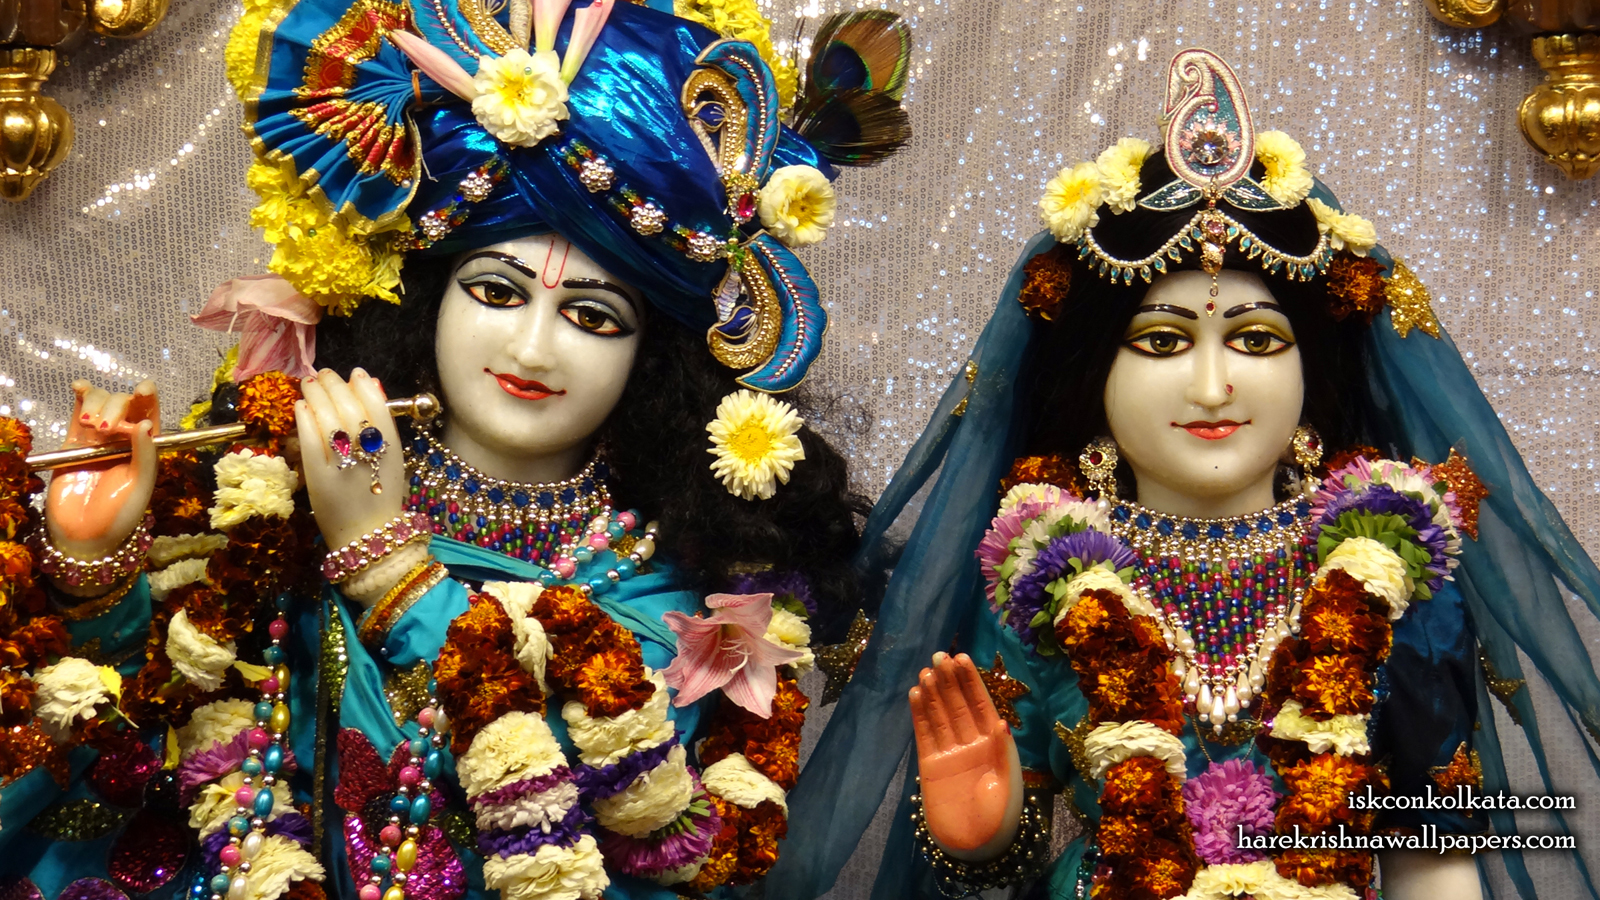 Sri Sri Radha Govinda Close up Wallpaper (007) Size 1600x900 Download